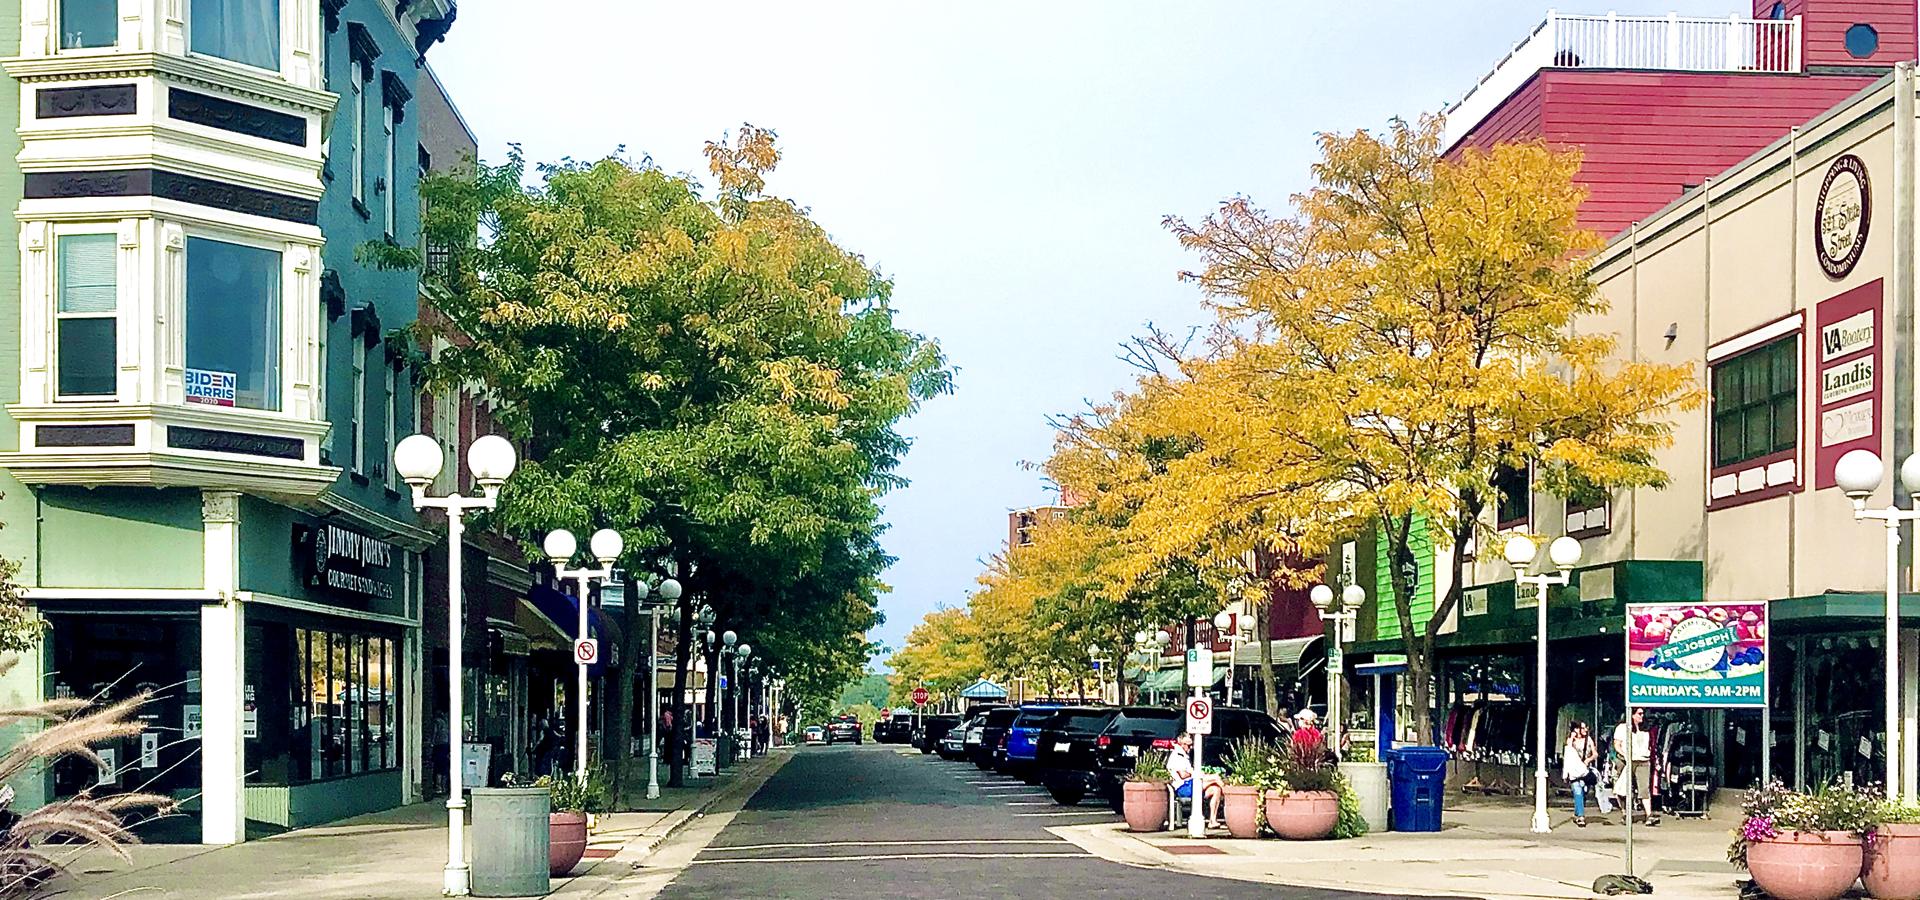 Saint Joseph, Michigan, USA